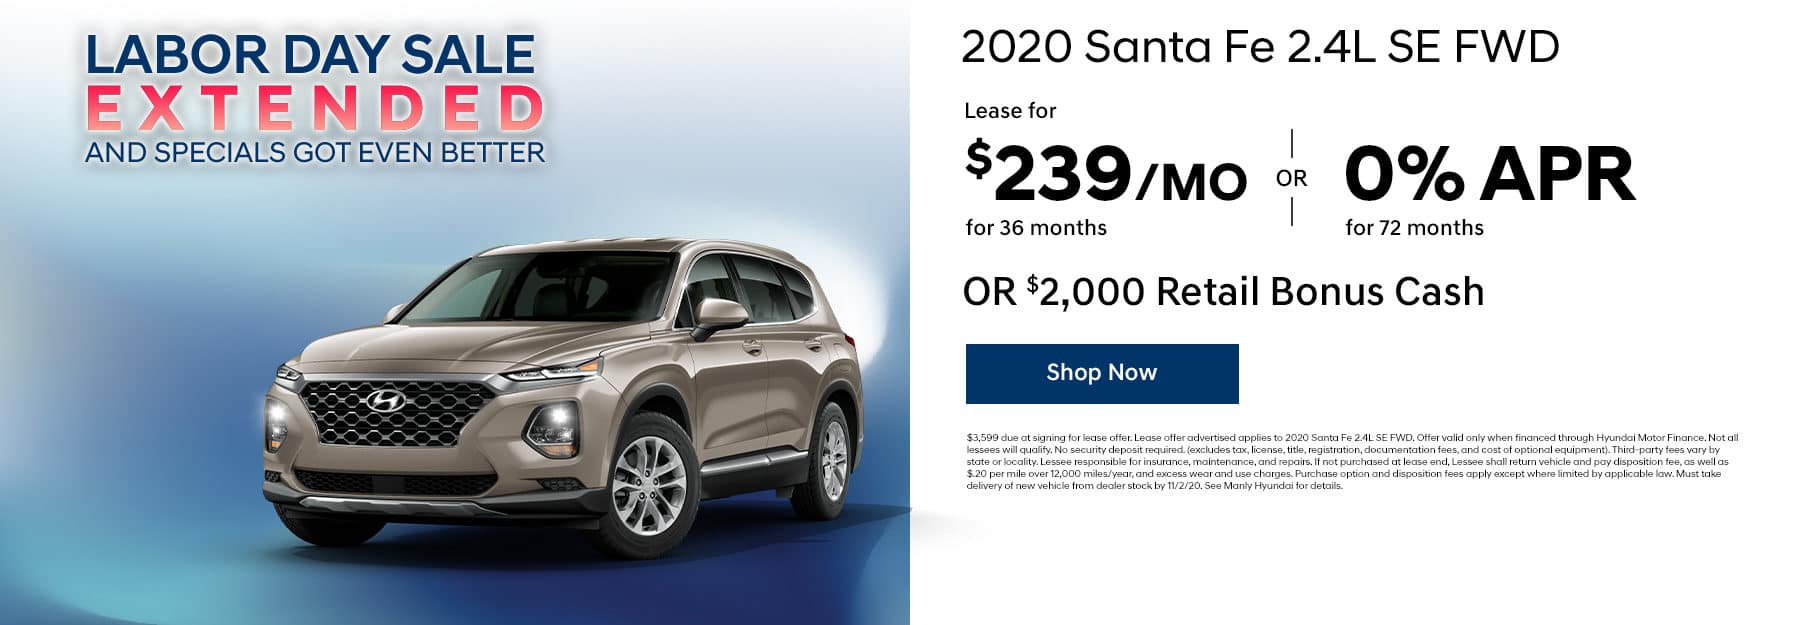 Santa Fe Lease